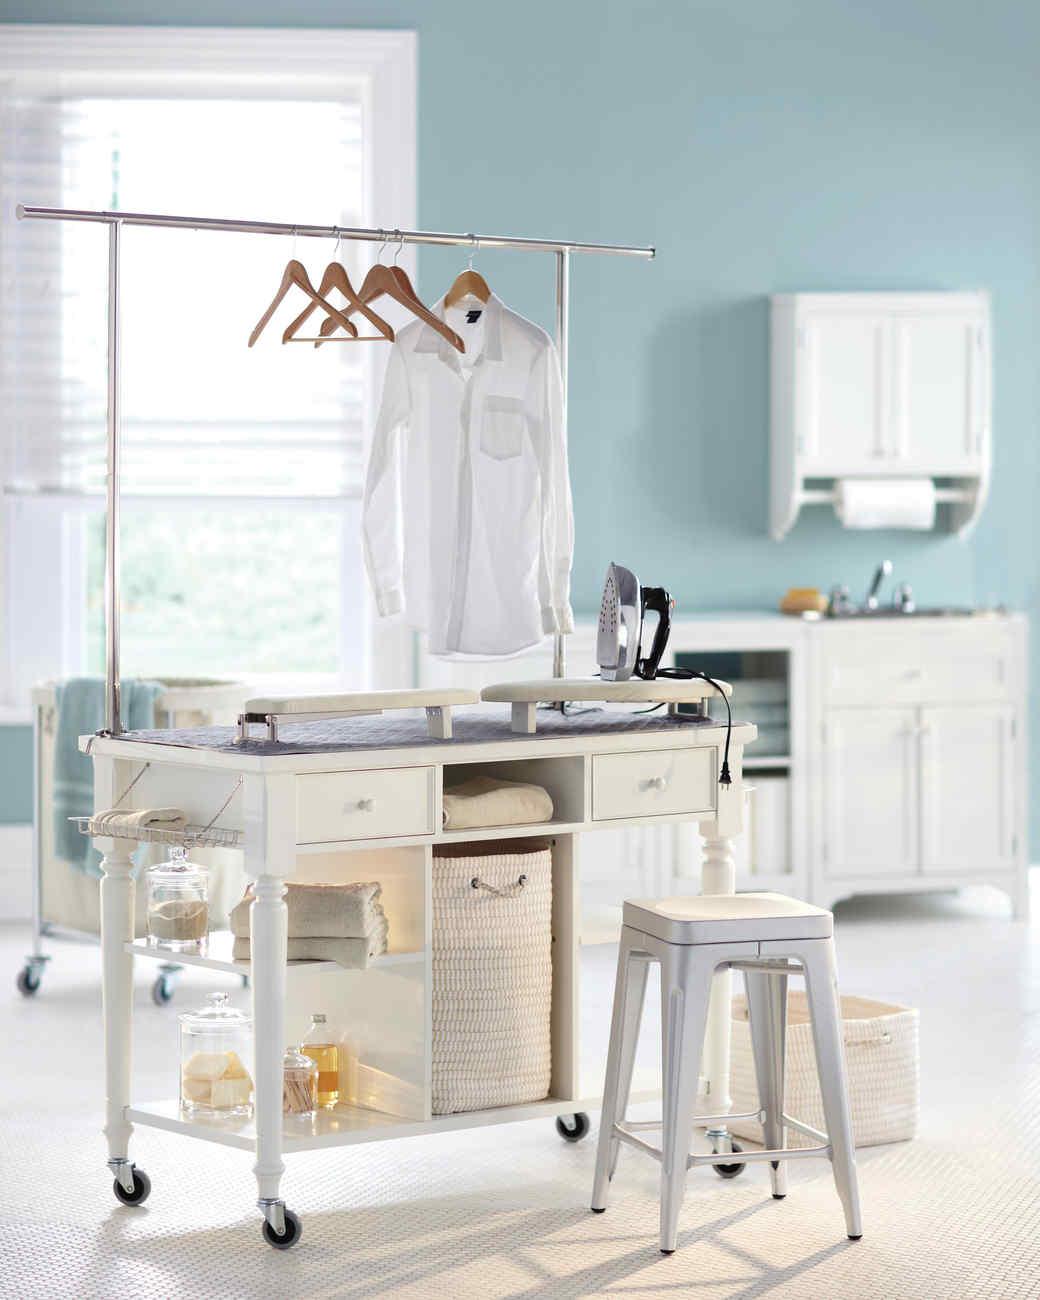 thd-mothersday-laundrycart-mrkt-0415.jpg